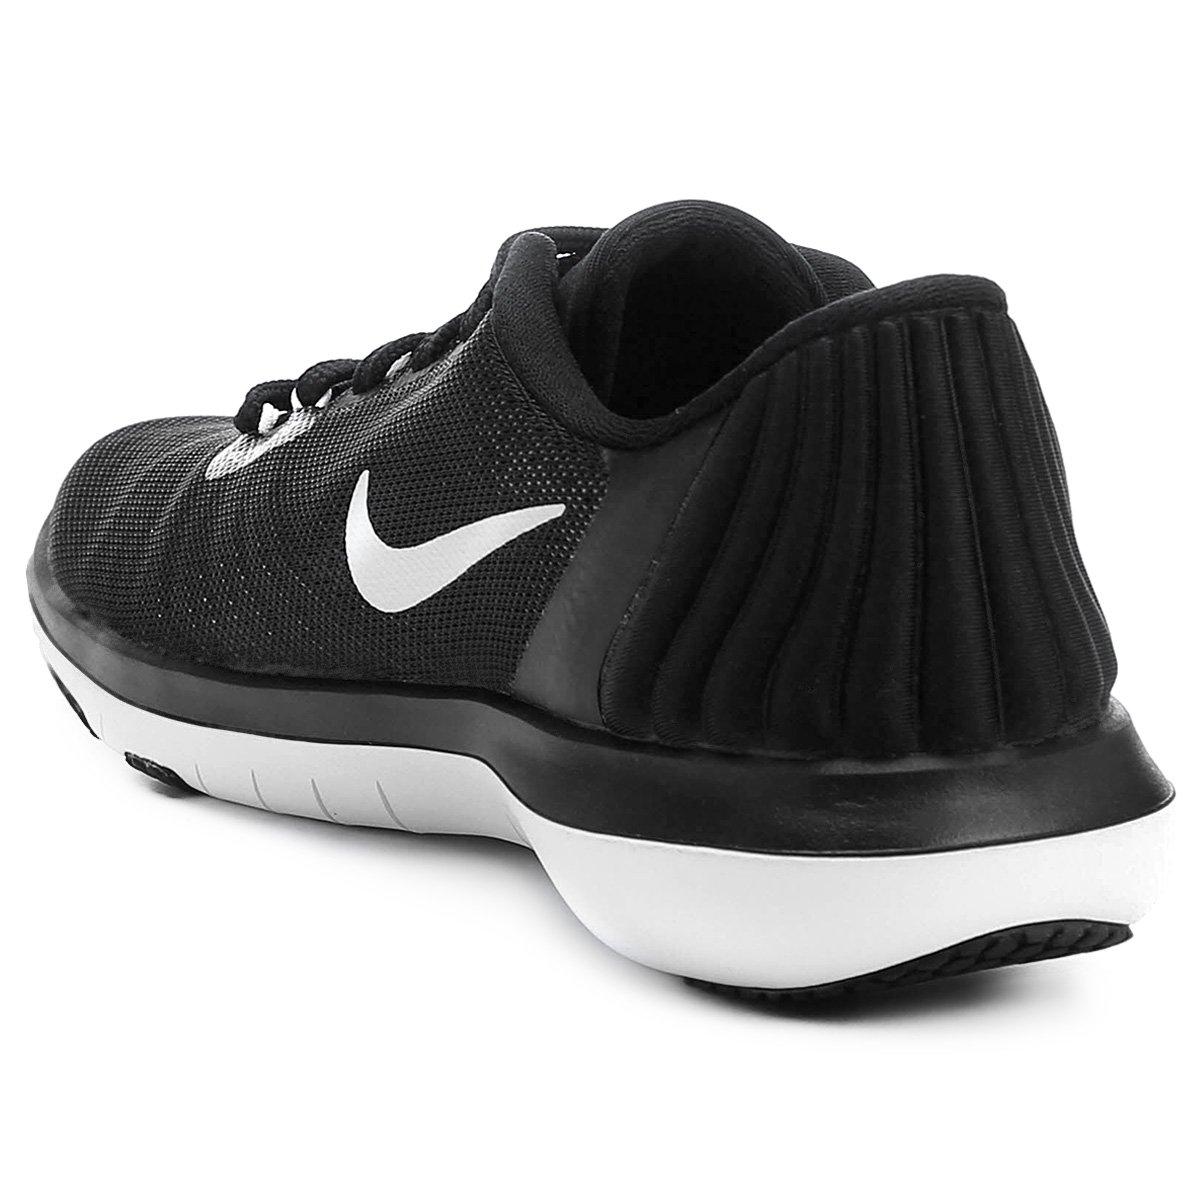 536b4e39c4 Tênis Nike Flex Supreme TR 5 Feminino - Preto e Branco - Compre ...